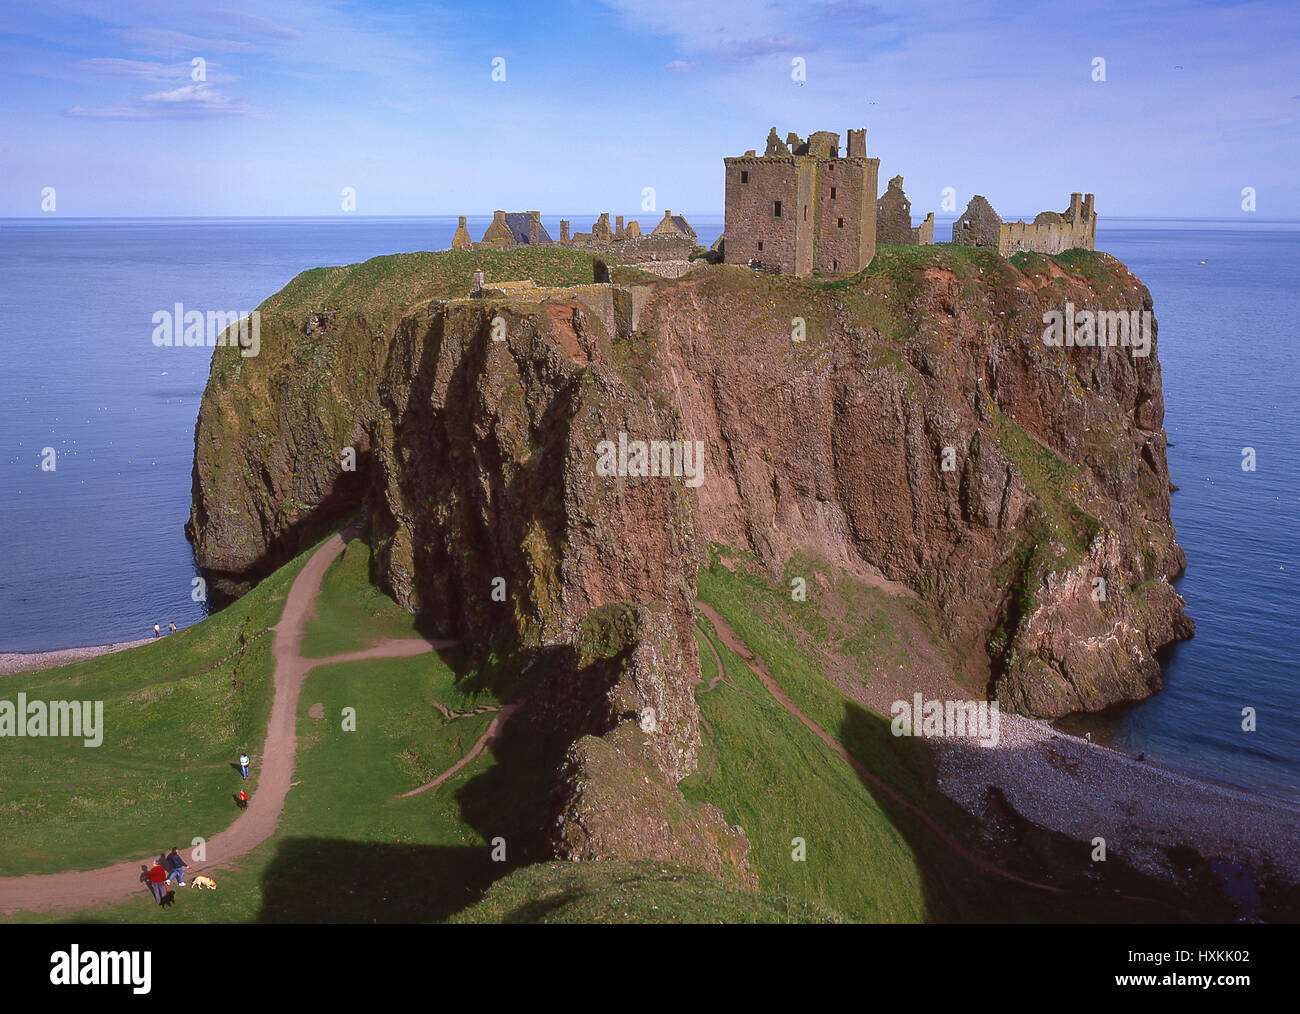 Ruins of Dunnottar Castle, Stonehaven, Aberdeenshire, Scotland, United Kingdom - Stock Image